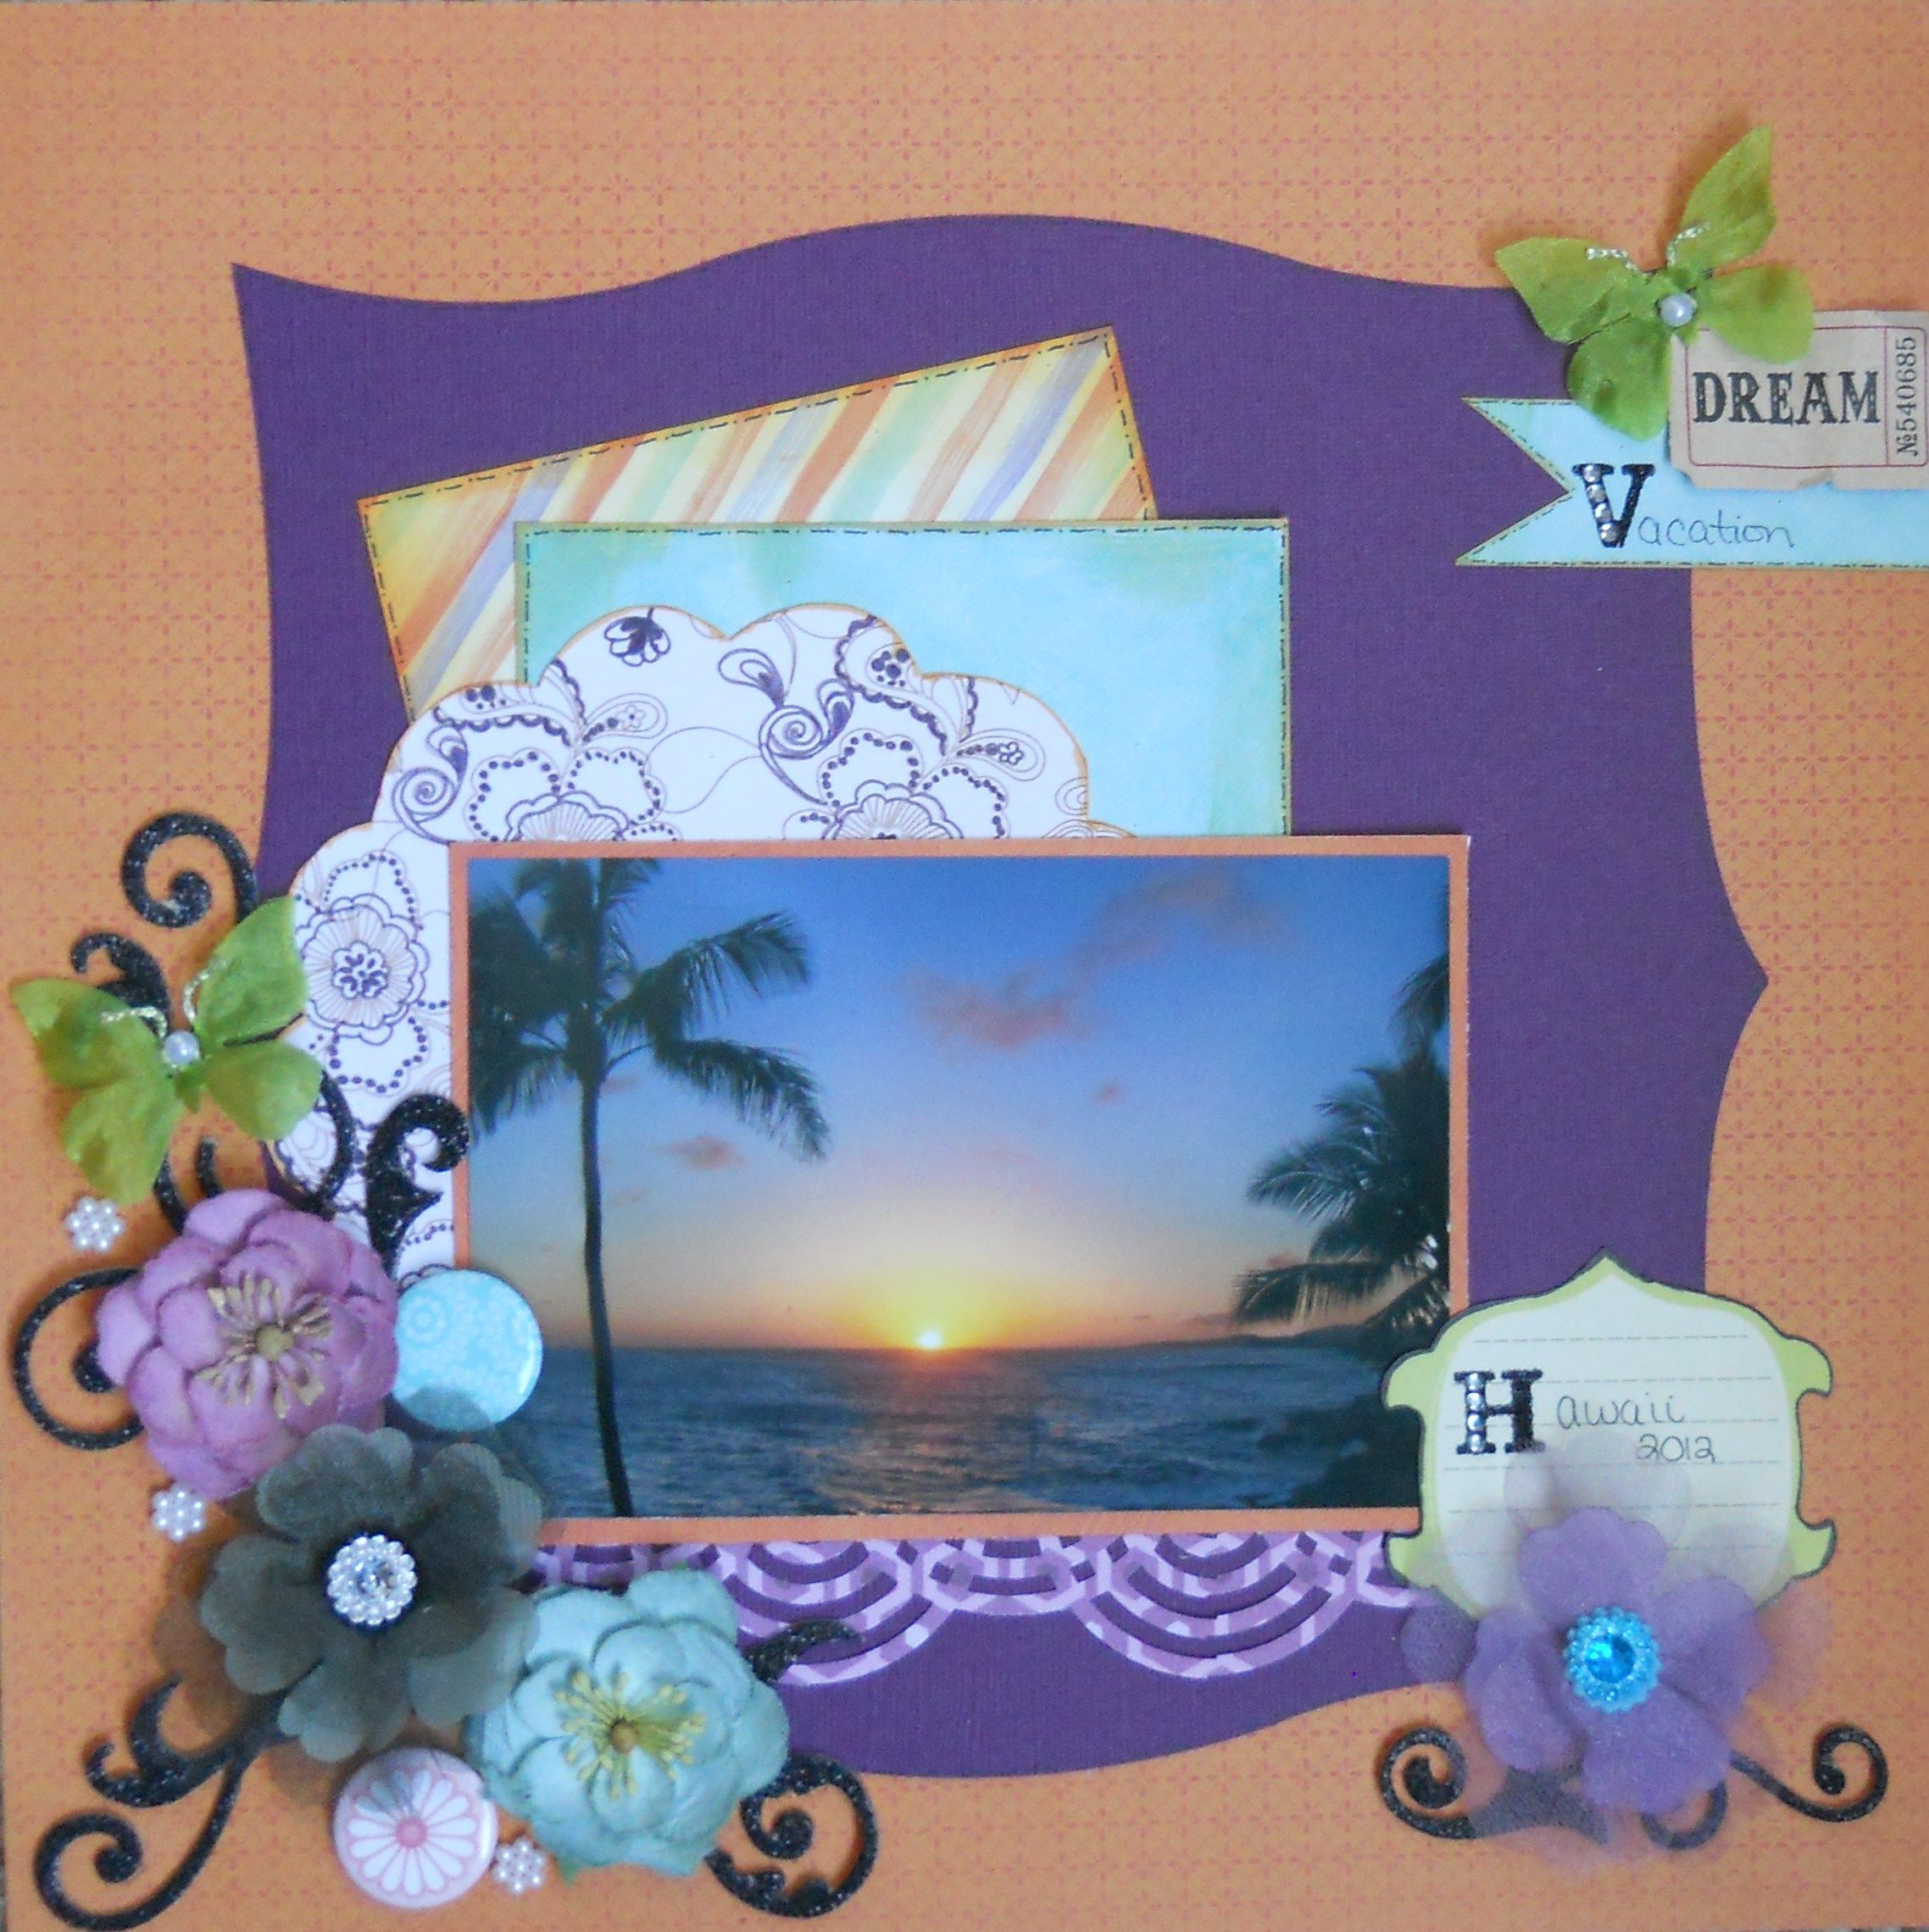 Scrapbook ideas hawaii - Dream Vacation Hawaii Scrapbook Com